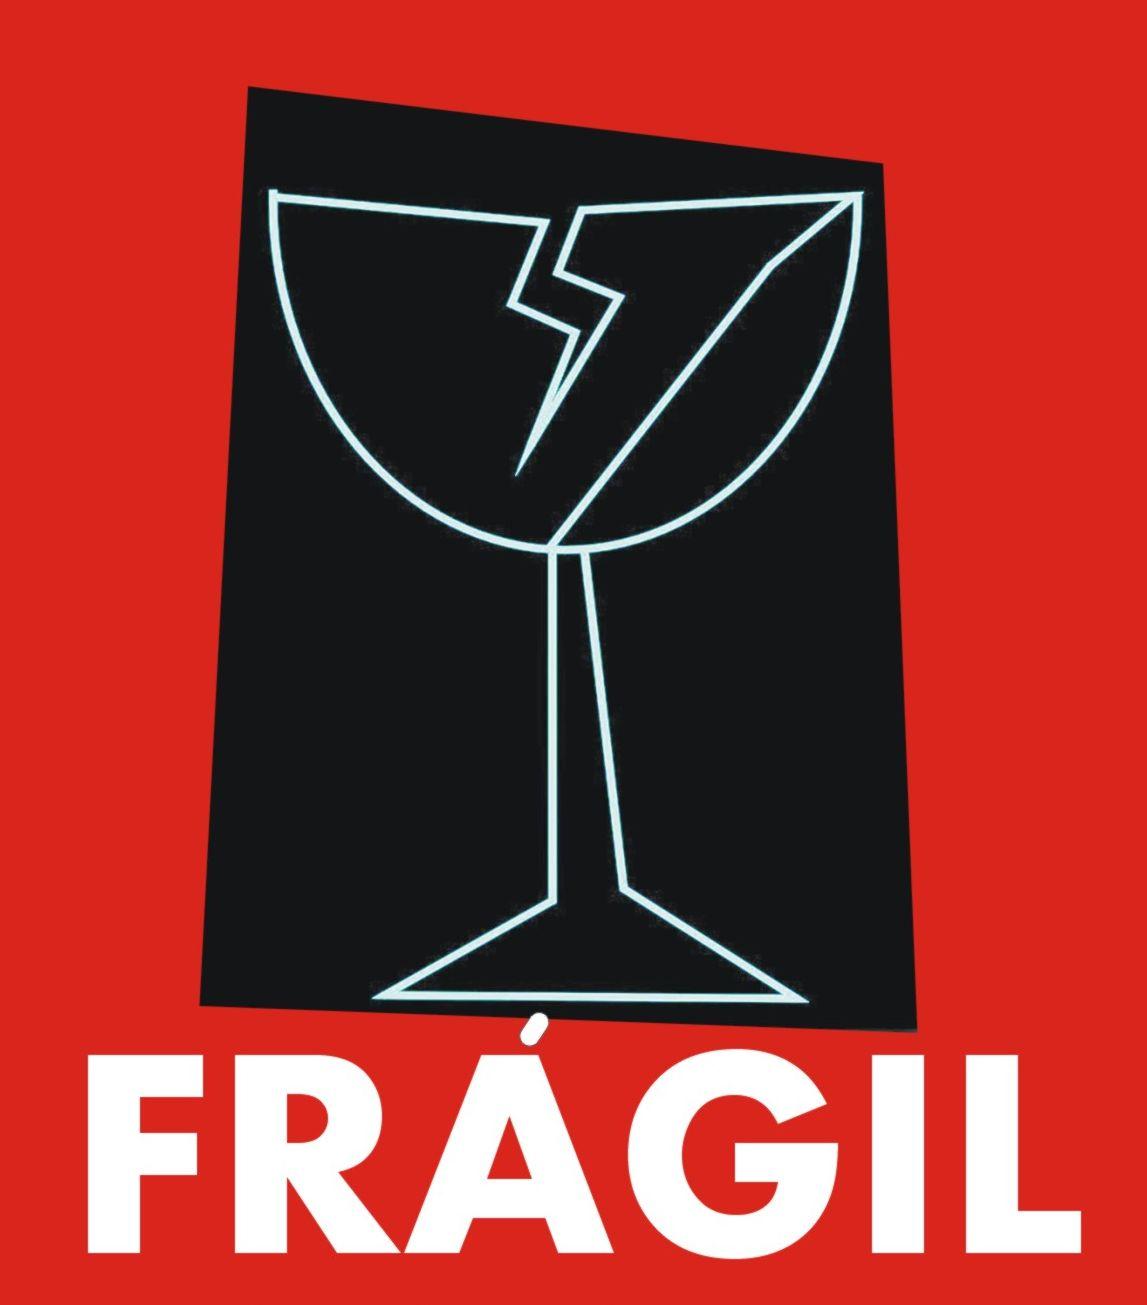 ... snapshot classic flipcard magazine mosaic sidebar snapshot timeslide: intervencionfragil.blogspot.com/2013_05_01_archive.html#!